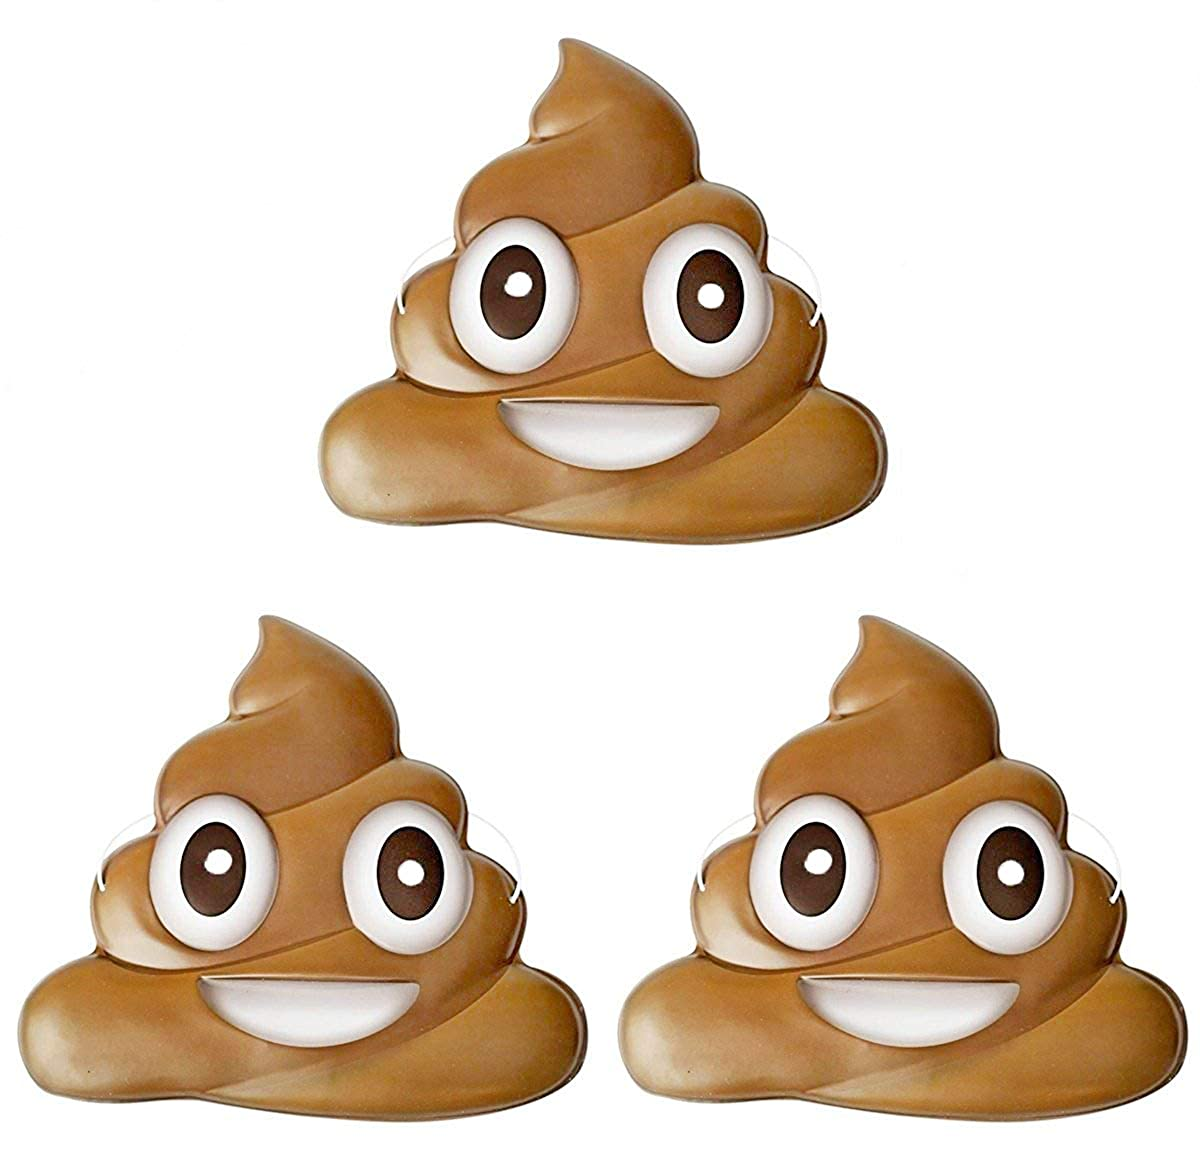 Dubster Brand Poop Emoji Party Supplies Costume Mask Pack of 10